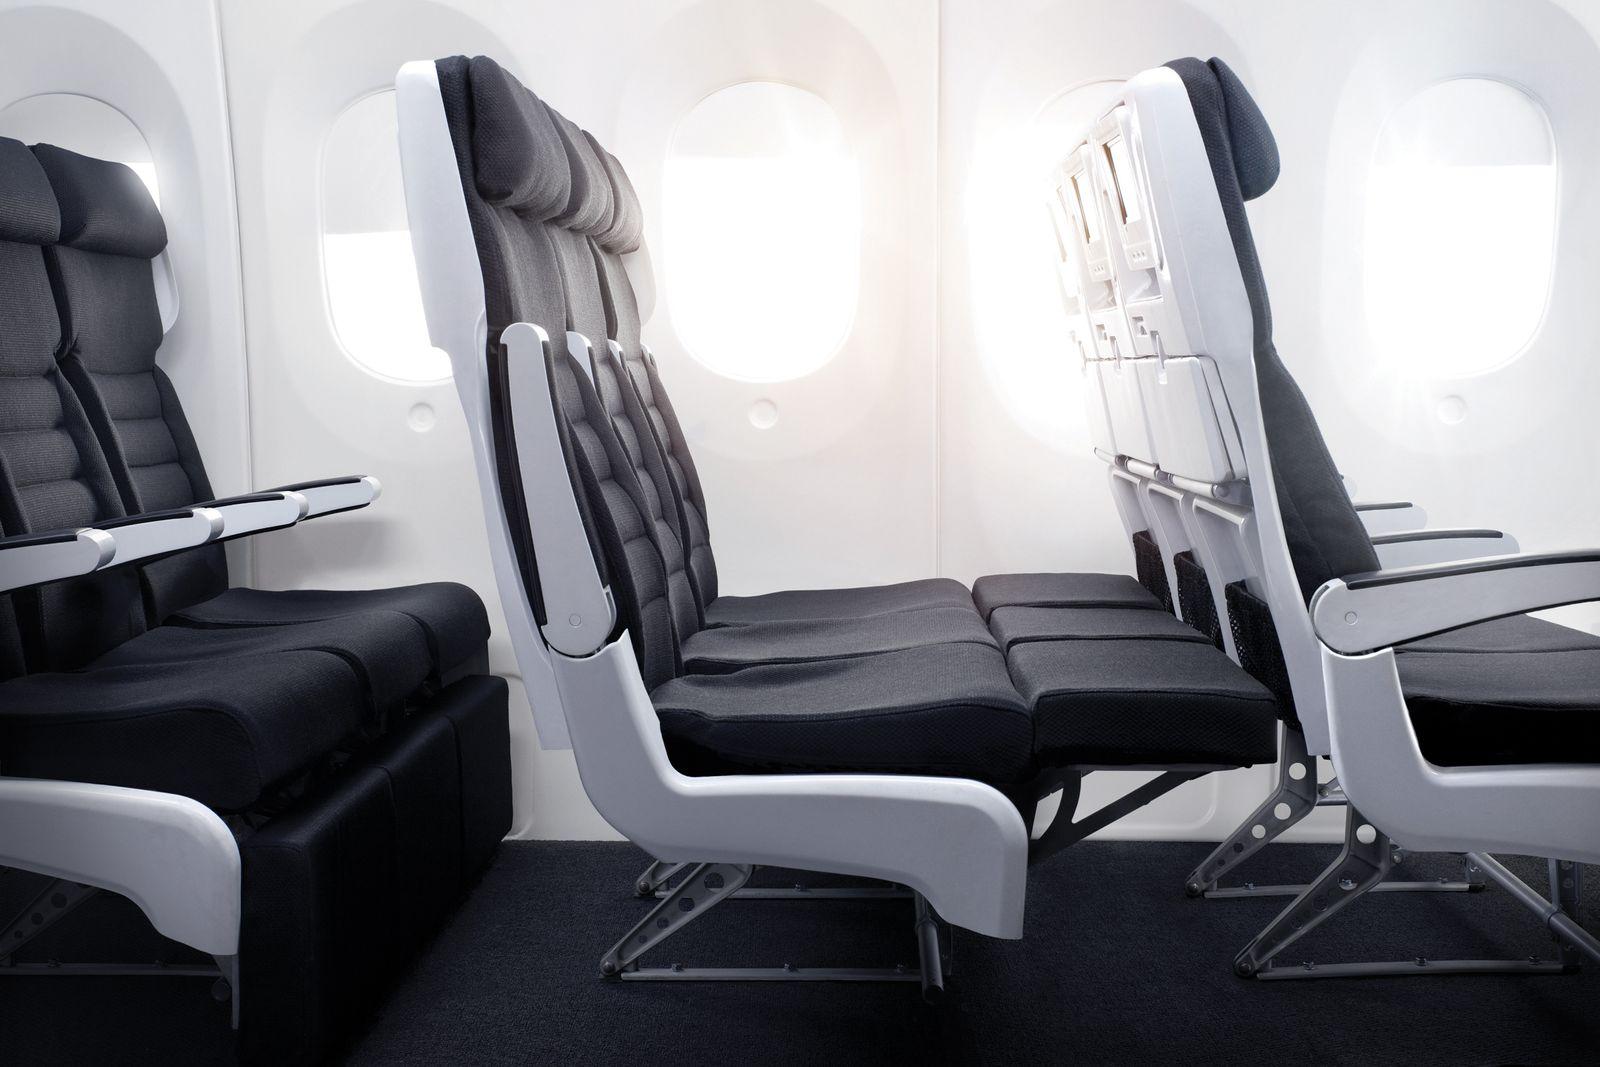 EINMALIGE VERWENDUNG Recaro / Air New Zealand SkyCouch